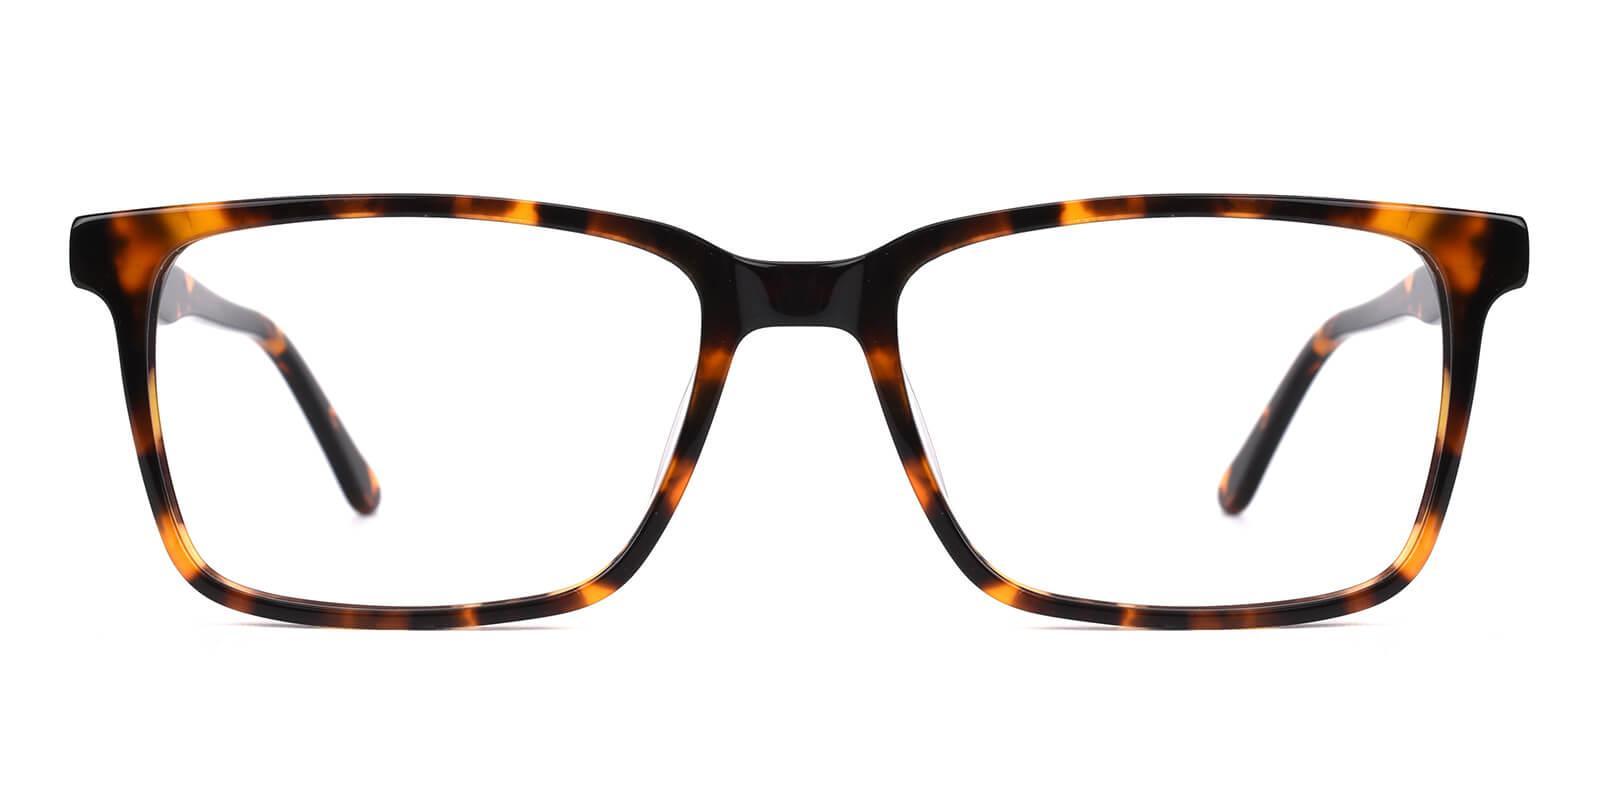 Sakou-Tortoise-Square-Acetate-Eyeglasses-additional2